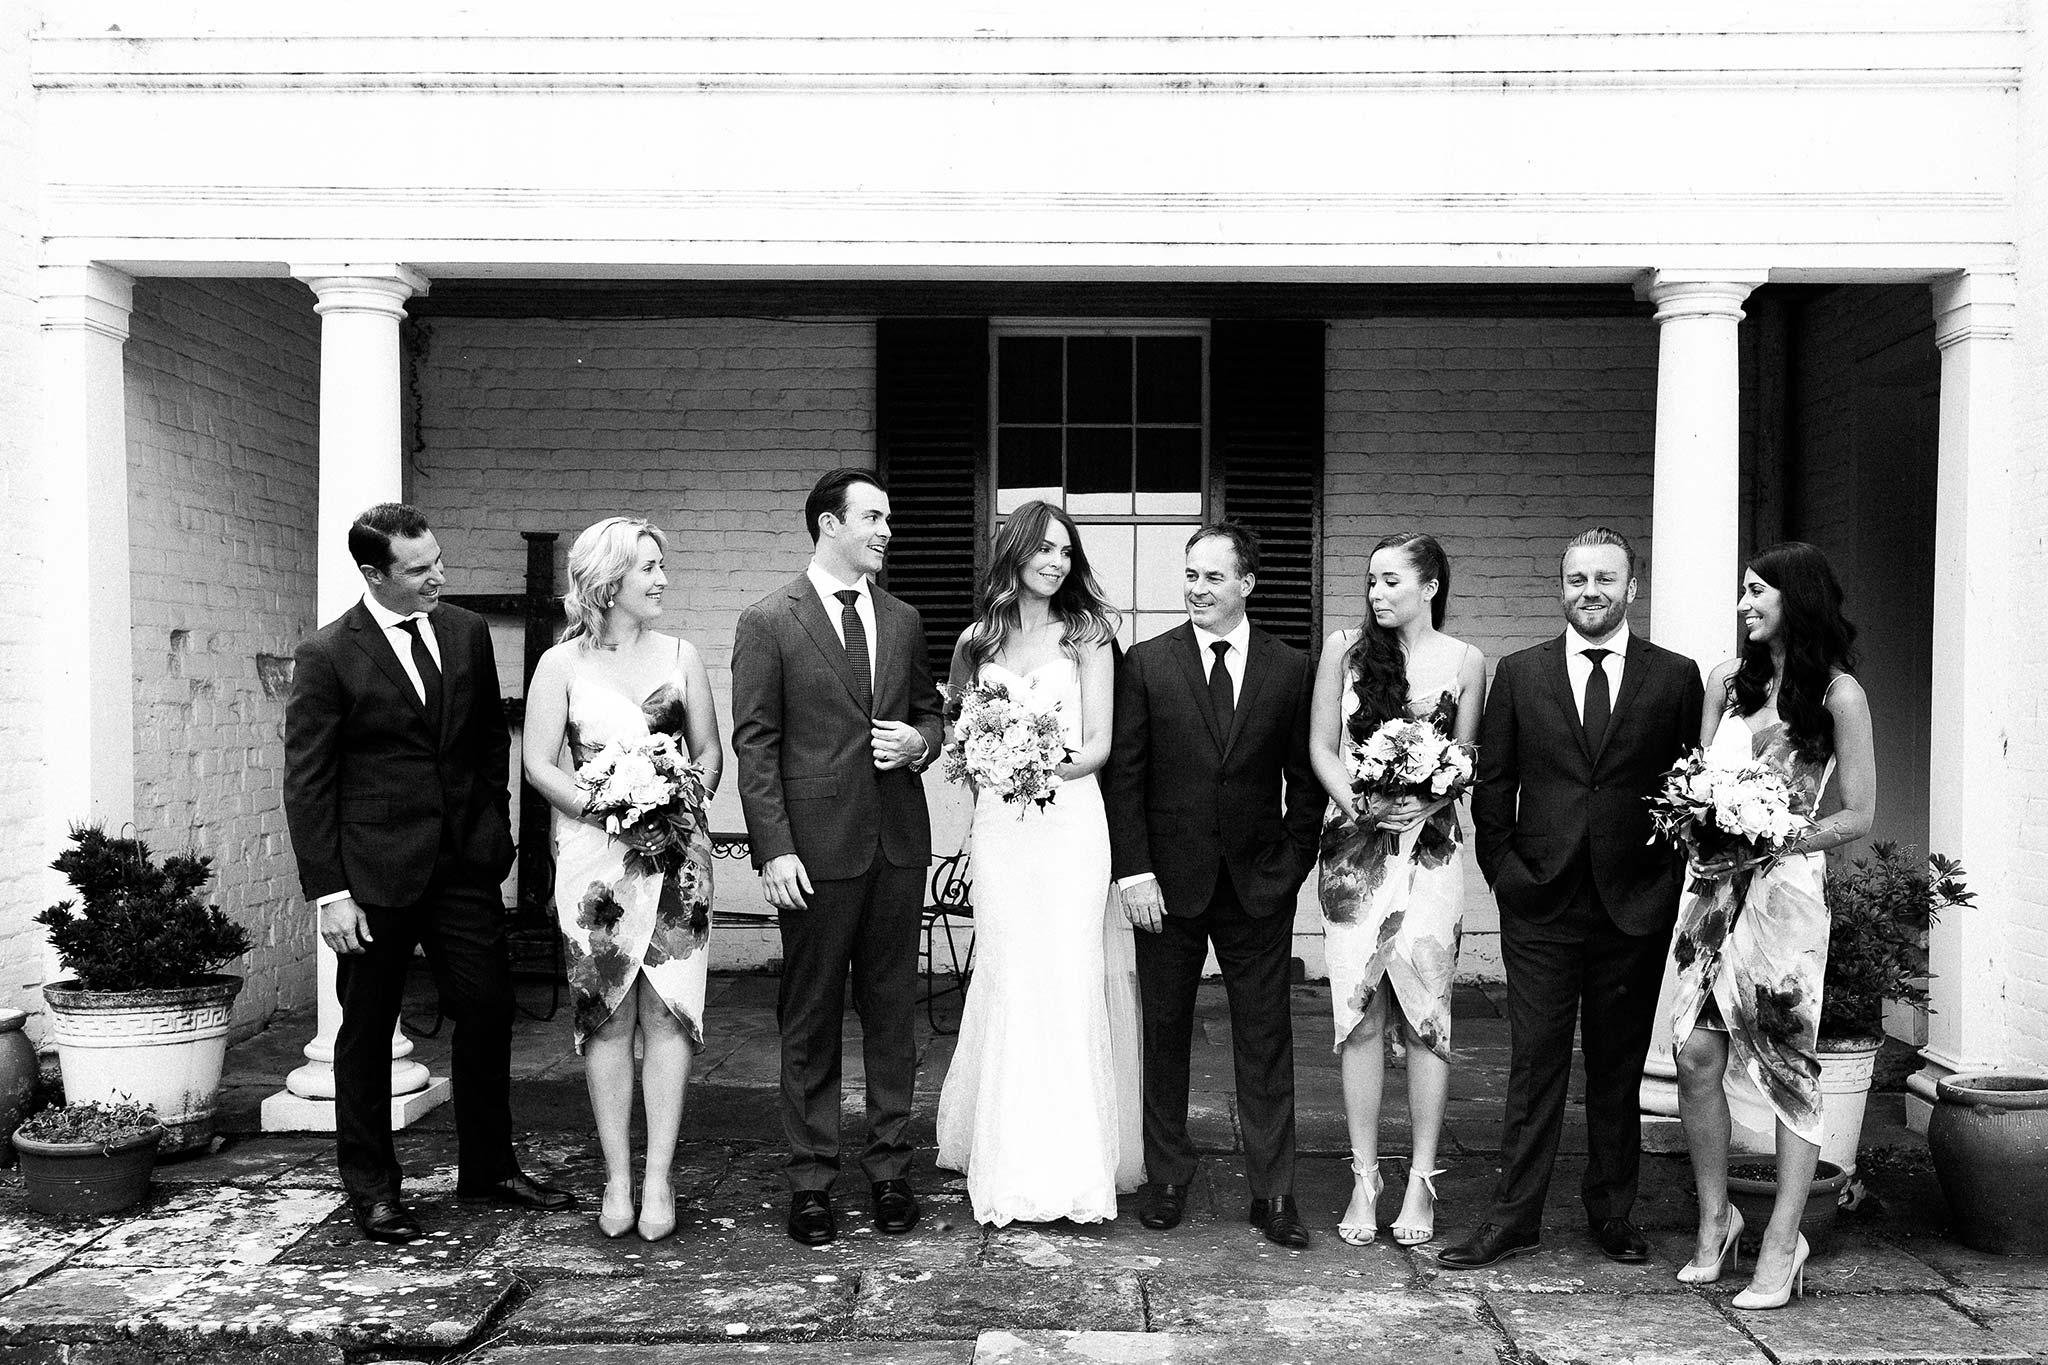 Launceston-Brickendon-Wedding-Photographer-group-portrait